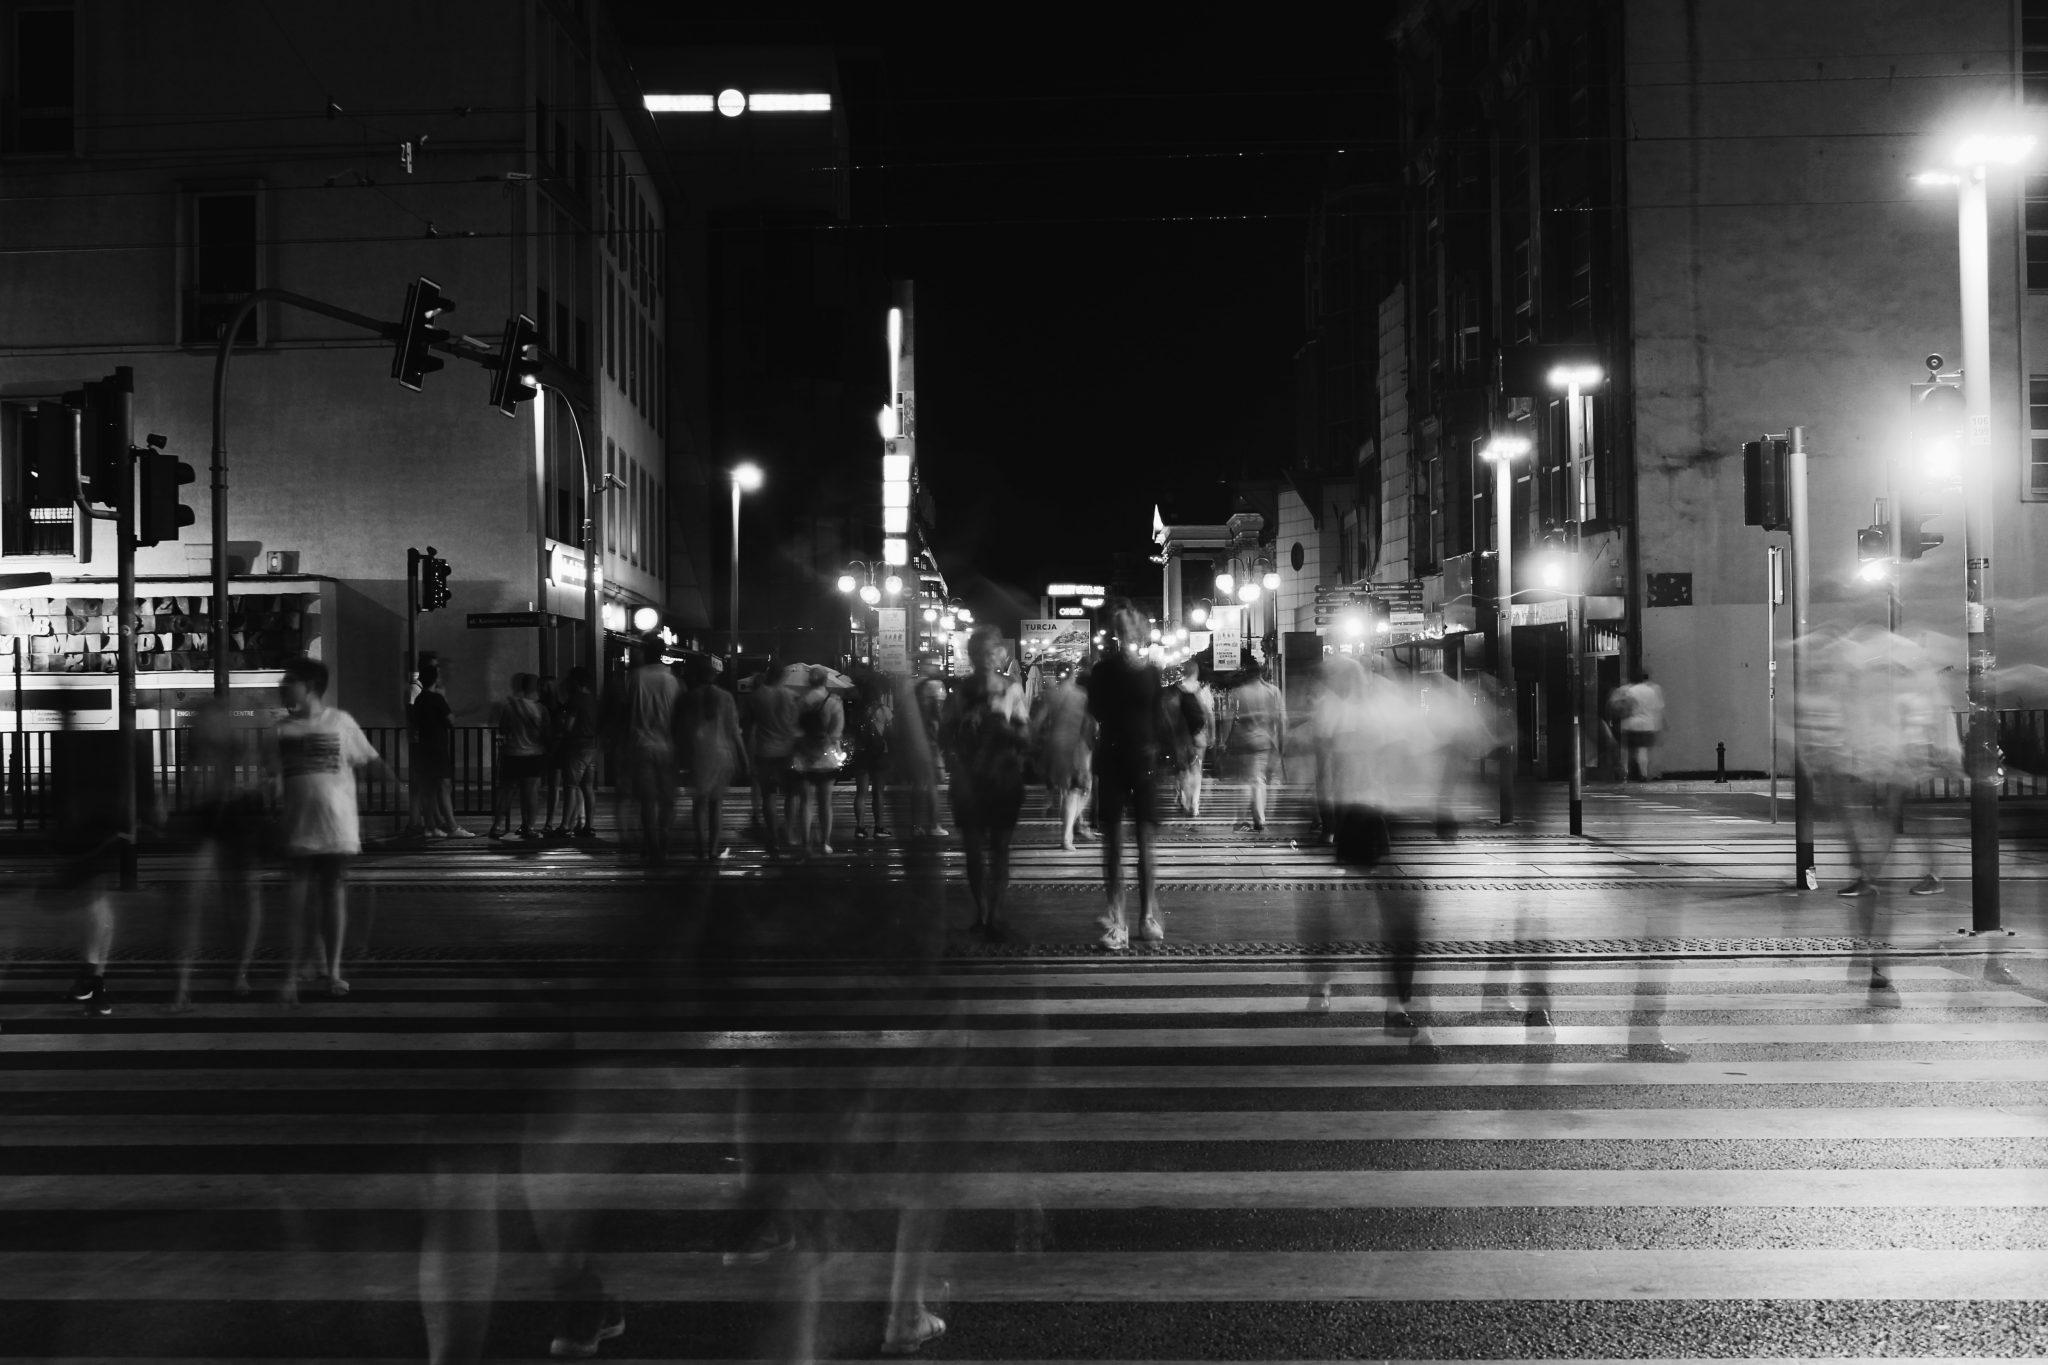 Personas cruzan un paso de cebra. Foto: Paweł L./Pexels